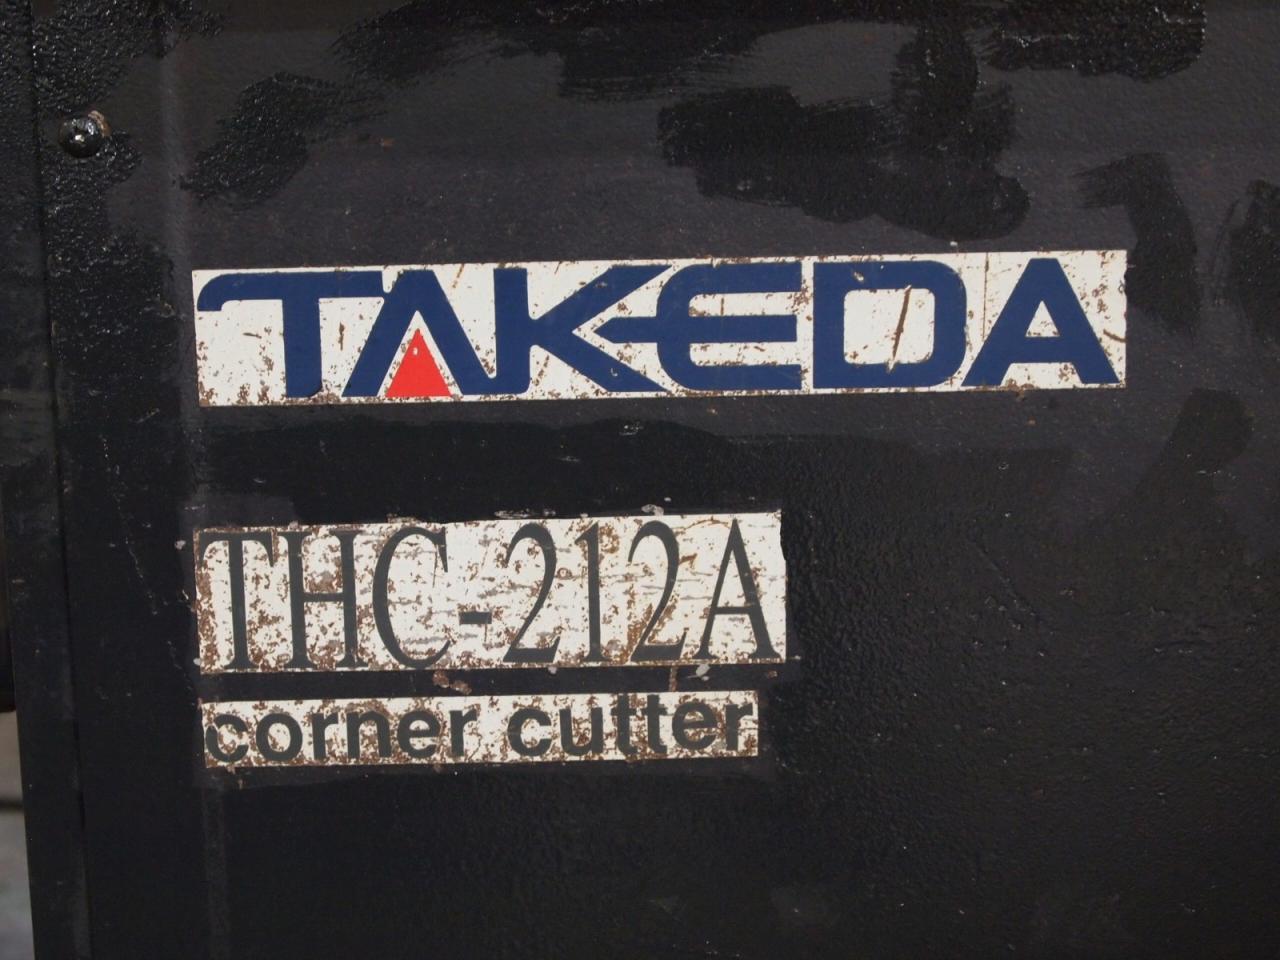 THC-212Aの型式とメーカー表示